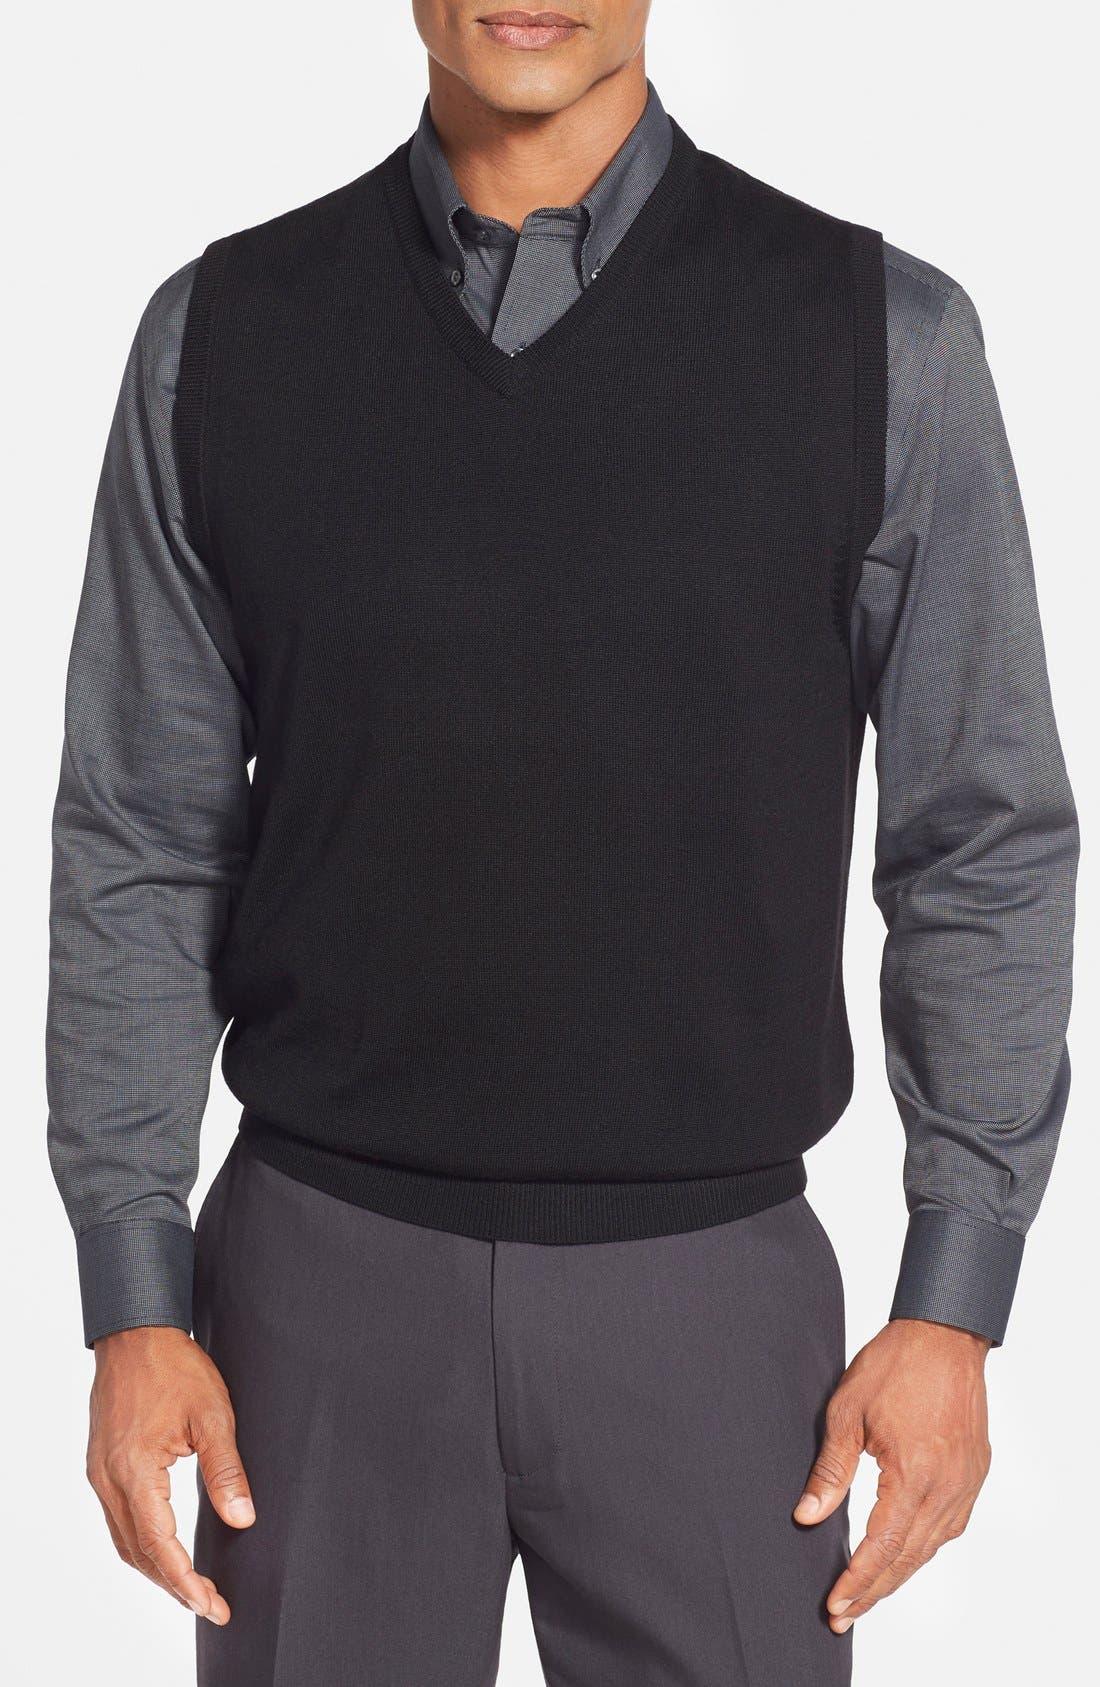 Cutter & Buck 'Douglas' Merino Wool Blend V-Neck Sweater Vest (Online Only)